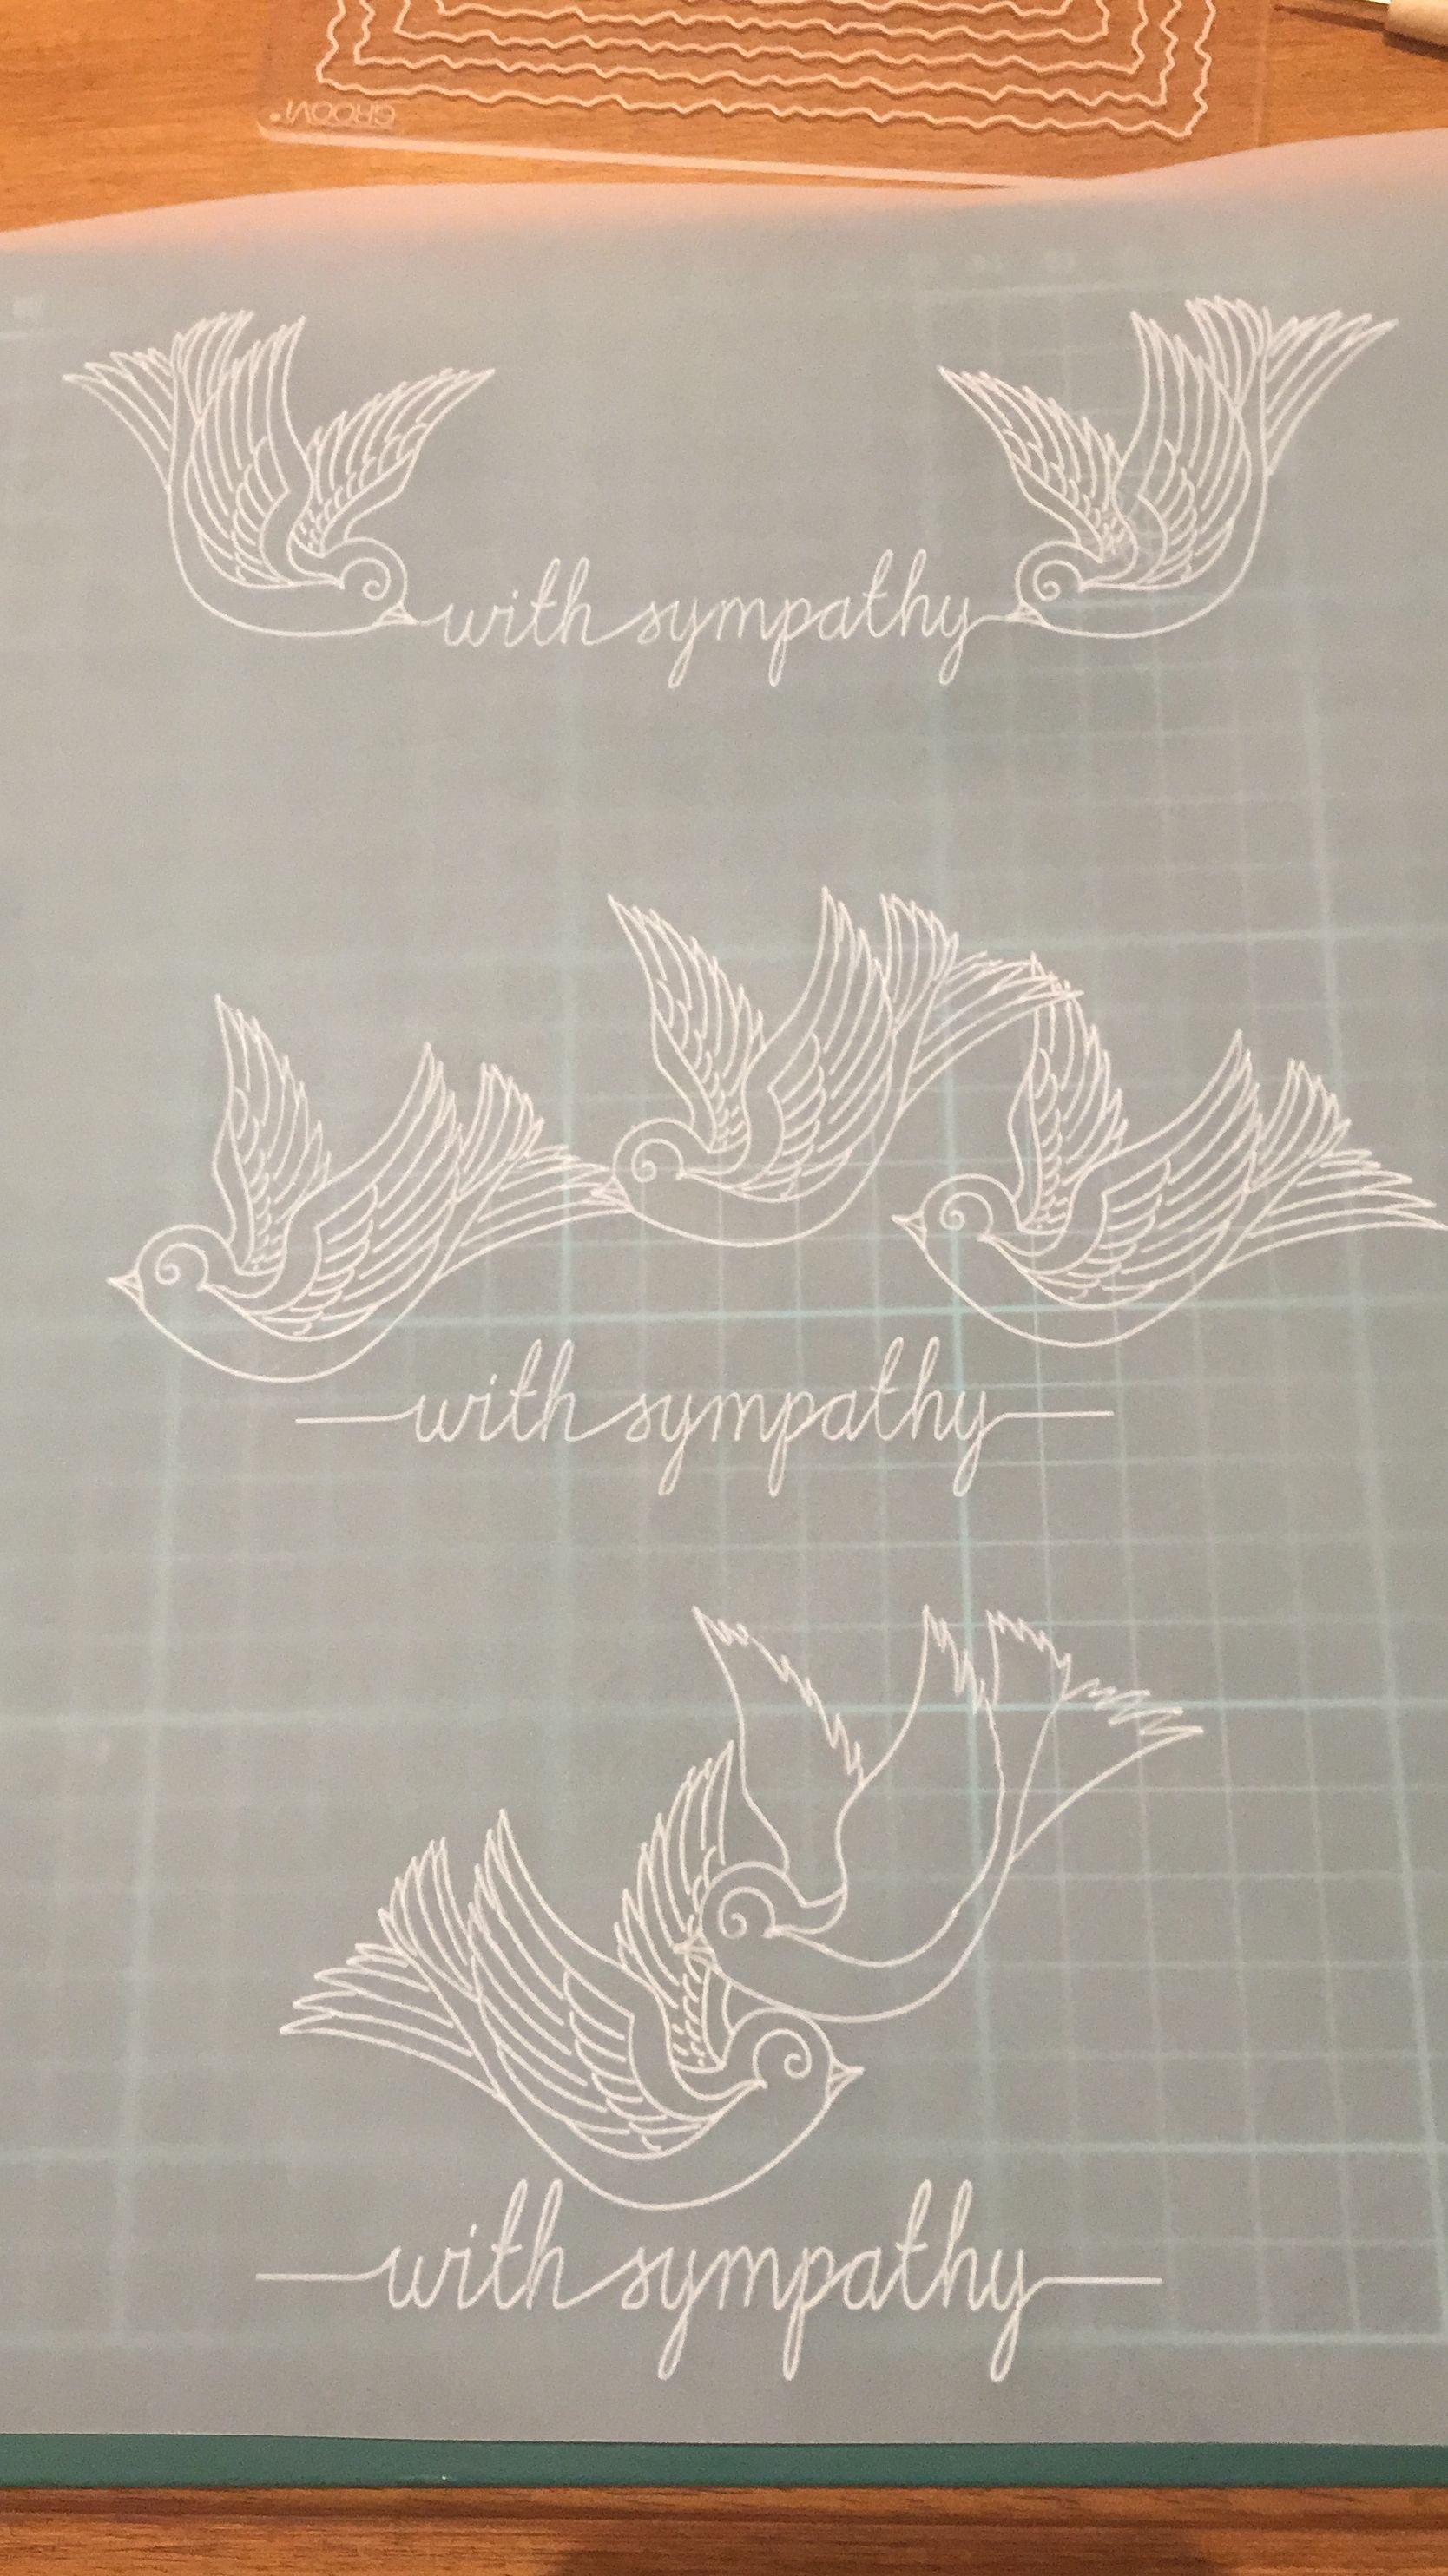 designed by delythlouise with sympathy doves groovi sadly bulk creating sympathy cards - Bulk Sympathy Cards